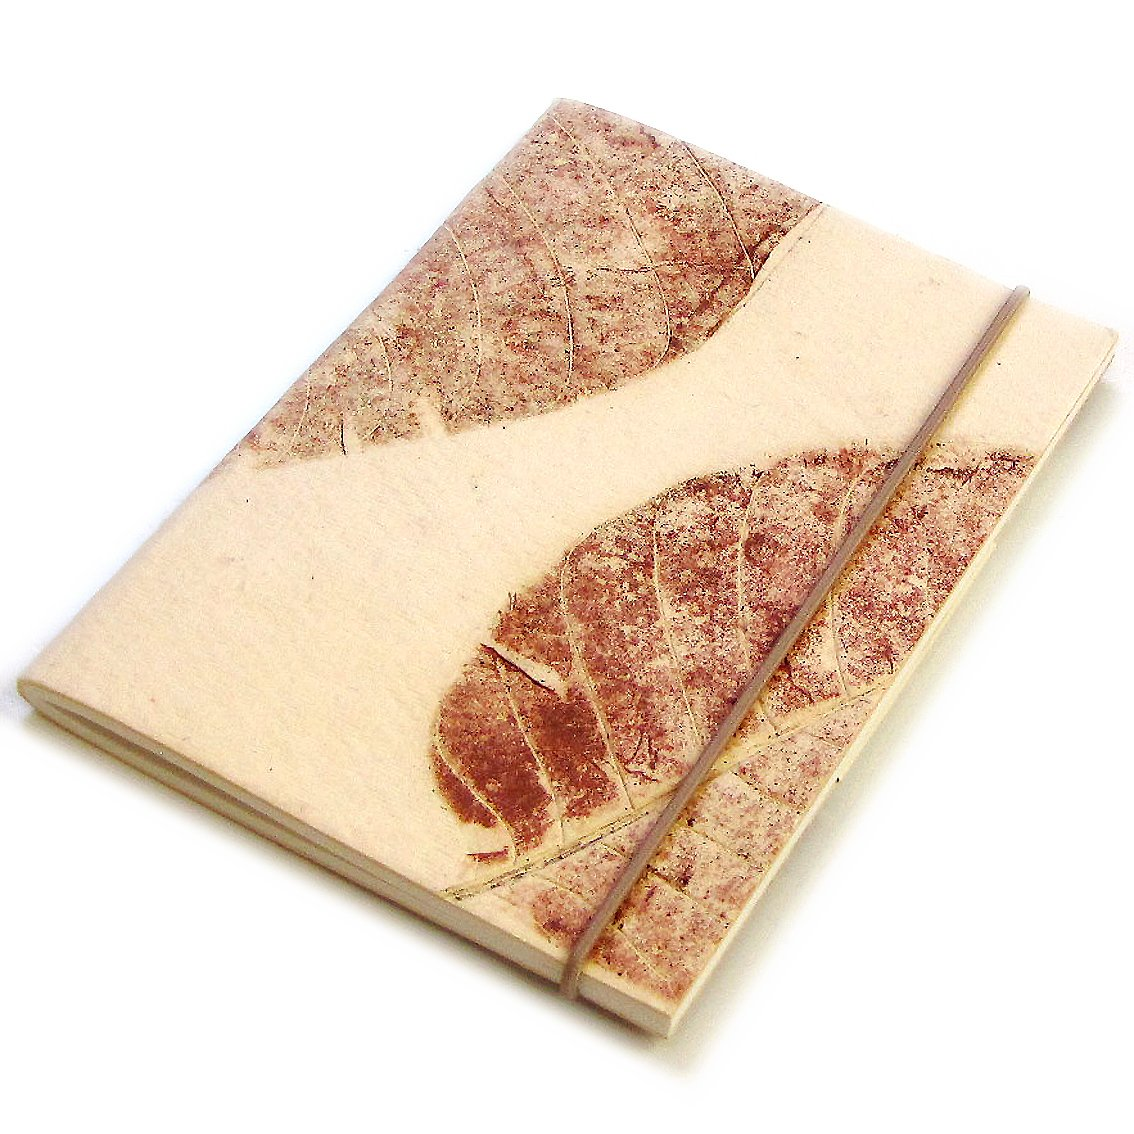 Handcrafted journal blank notebook cream handmade large leaf paper sketching 5x7 40pp